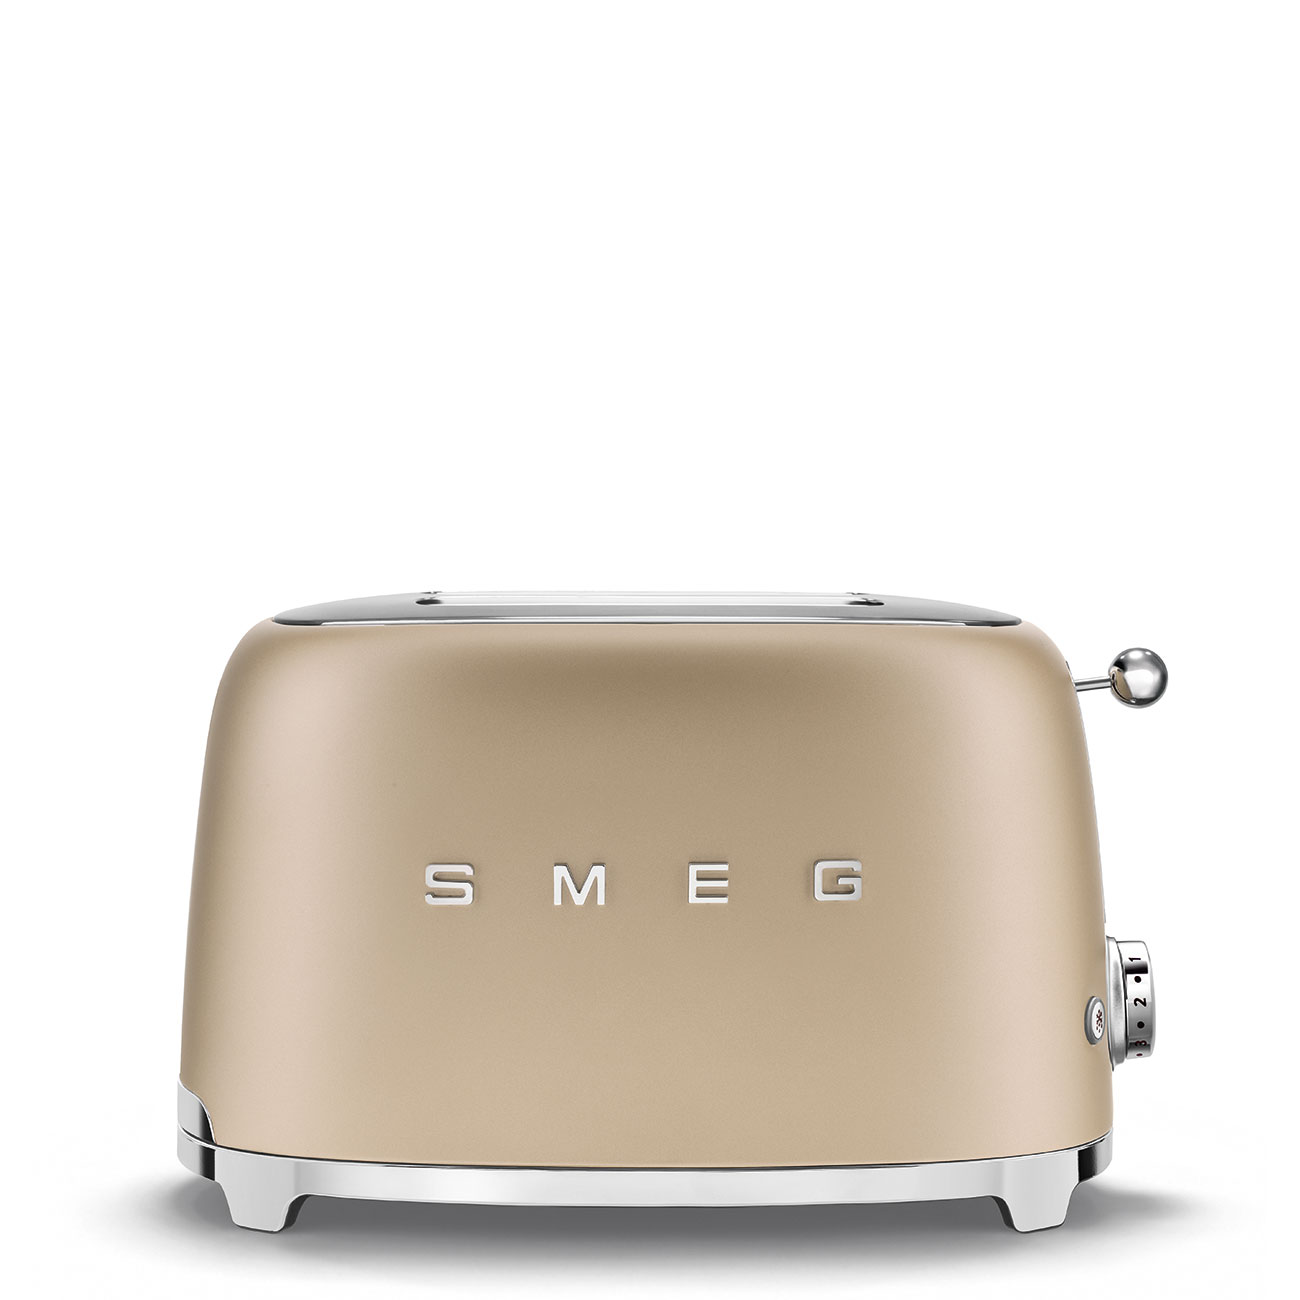 Онлайн каталог PROMENU: Тостер на 2 слота Smeg 50 Style, 19,8 х 31 х 19,5 см, шампань Smeg TSF01CHMEU